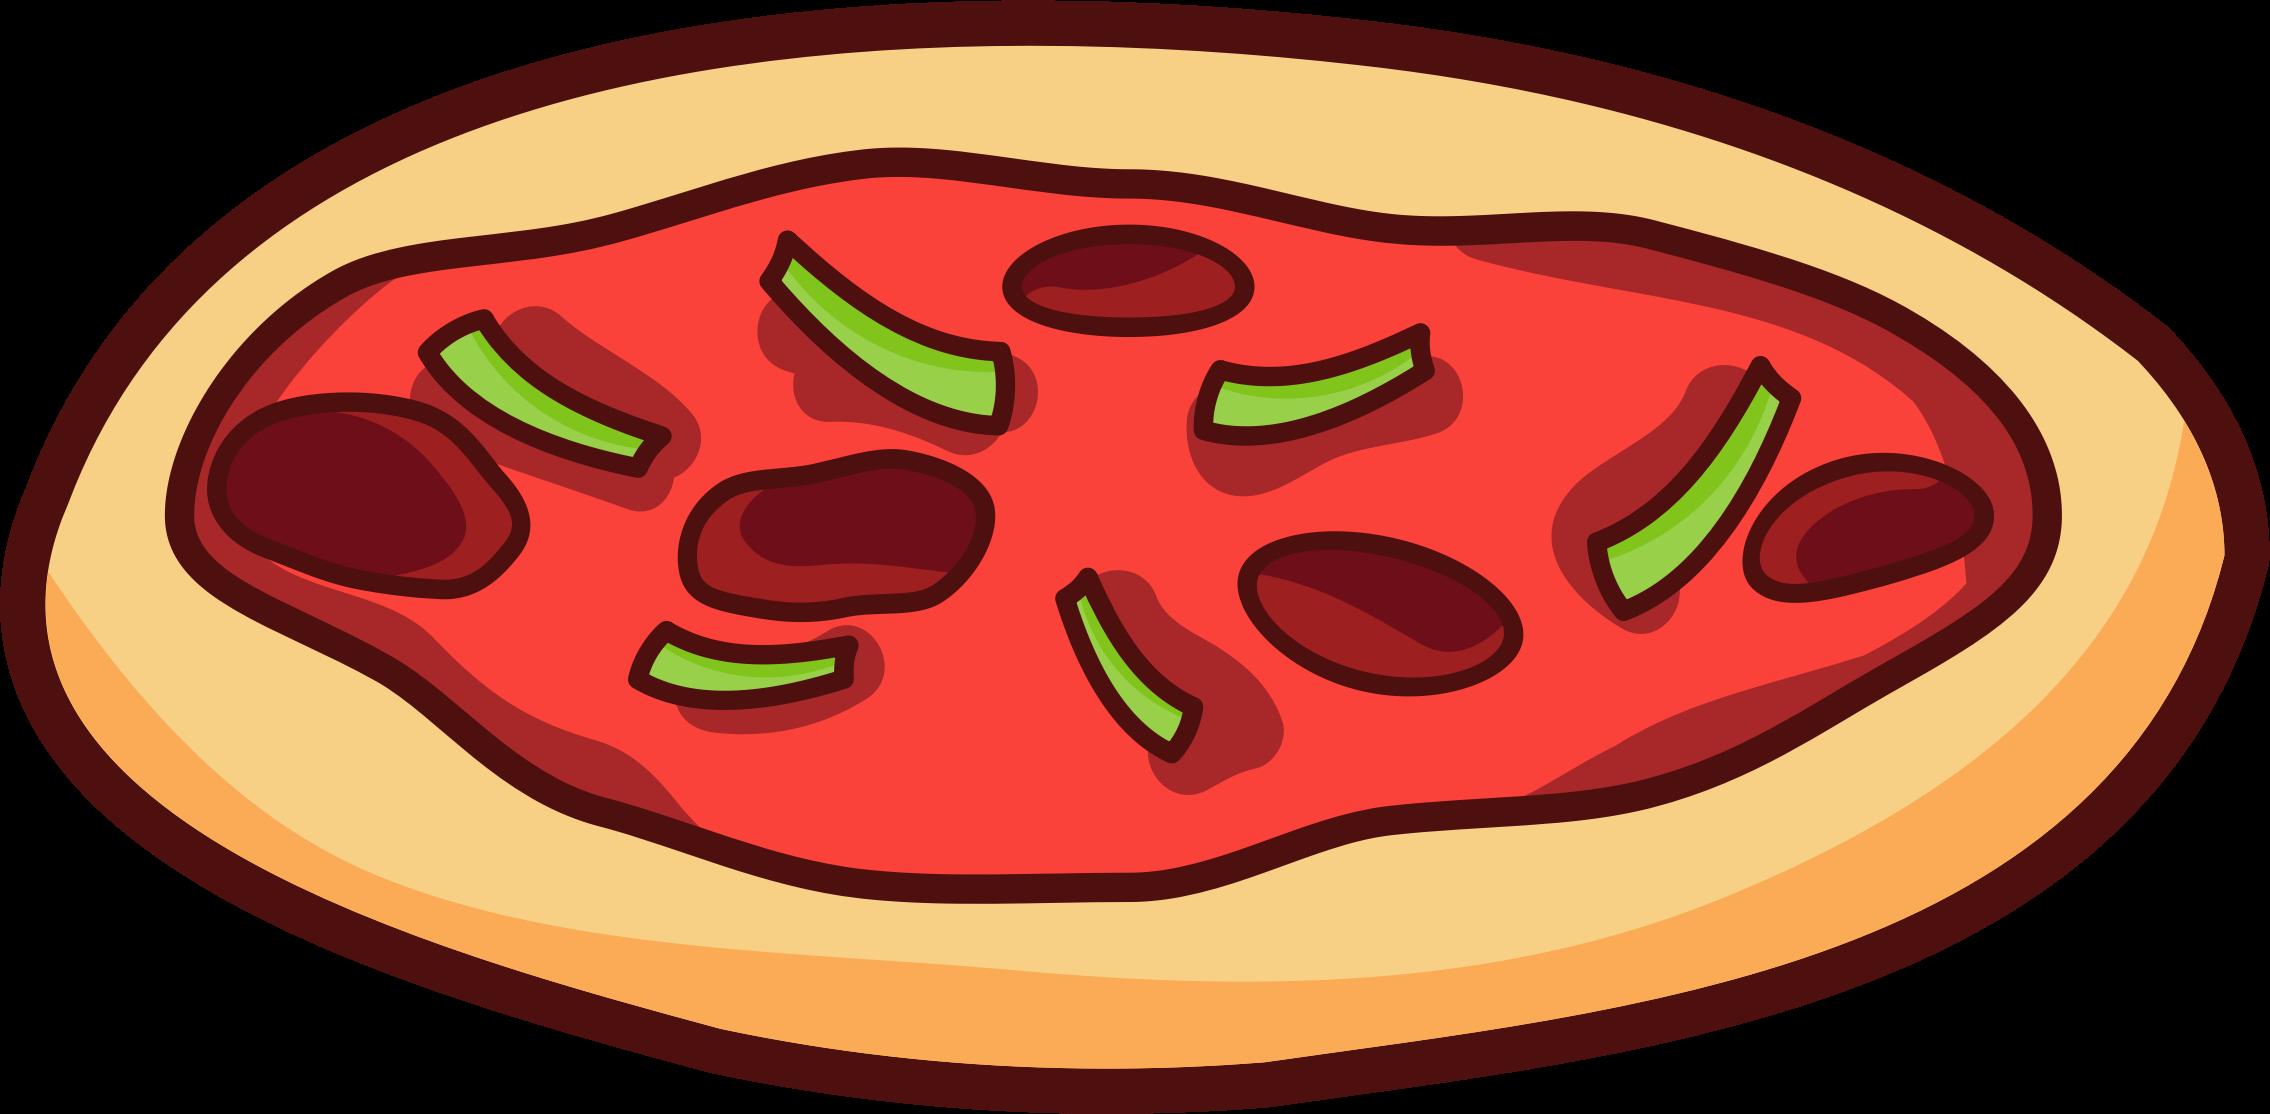 Hotdog clipart chicken pizza. Pepperoni big image png